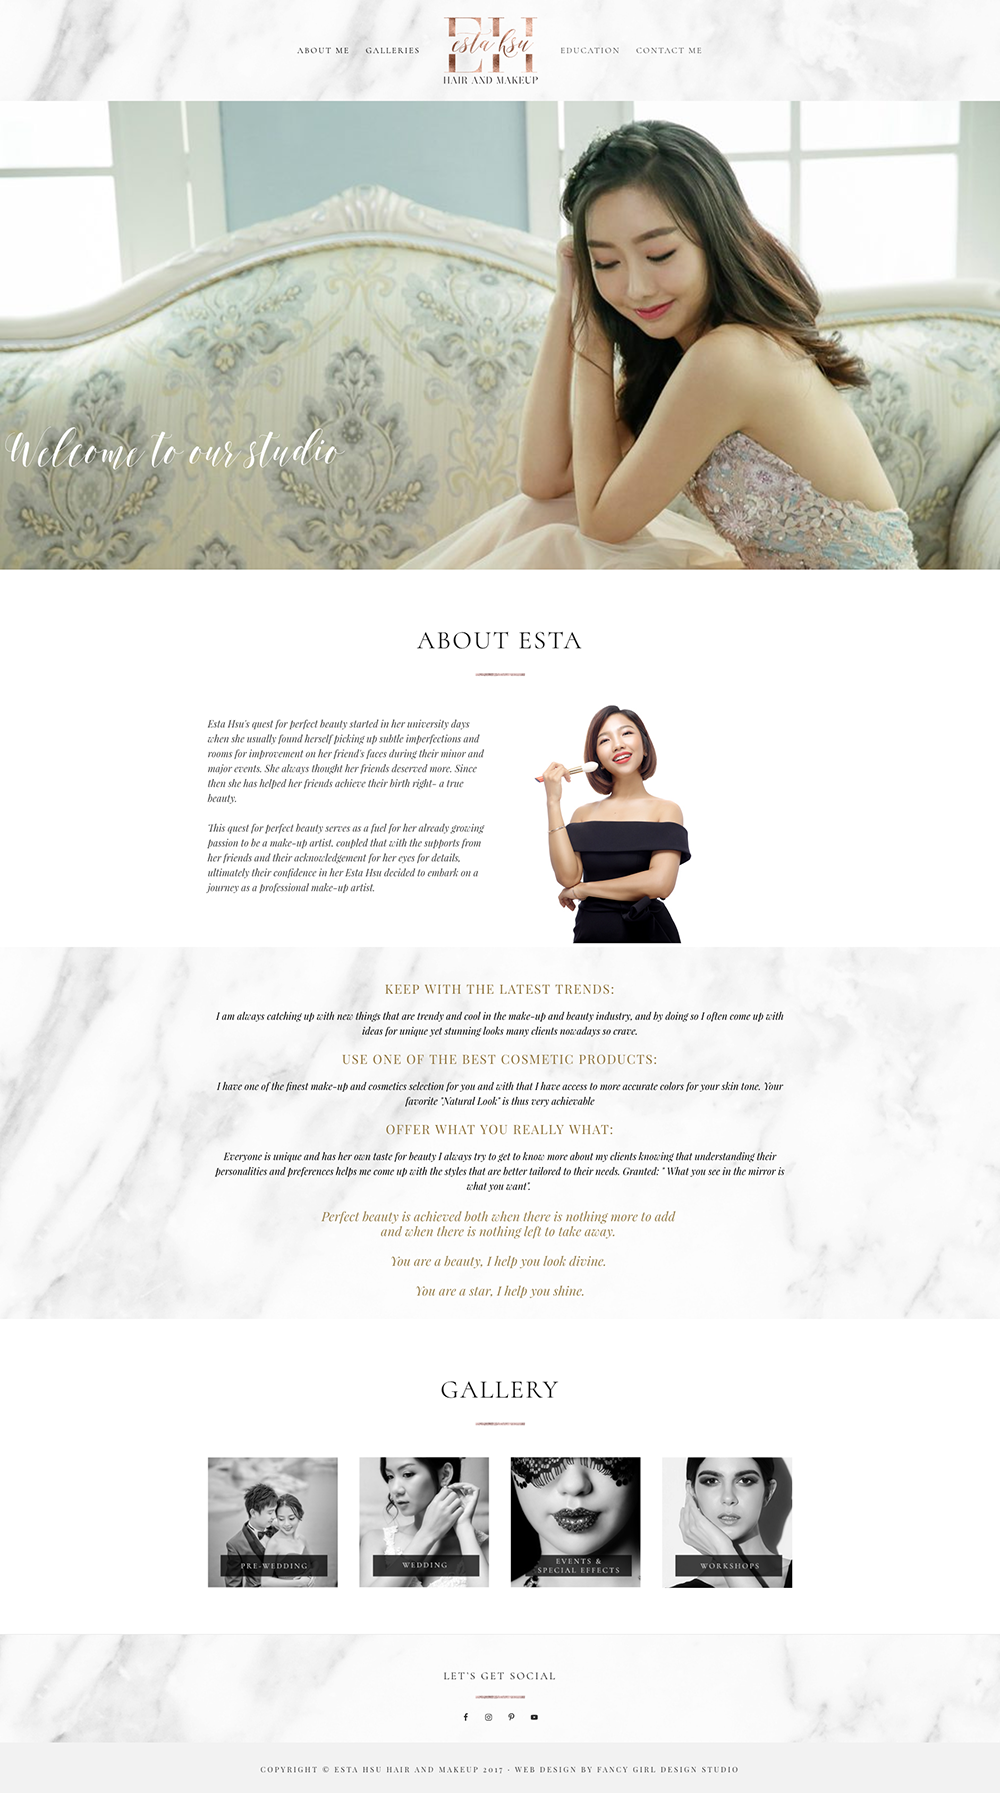 website design for Esta Hsu by Fancy Girl Design Studio